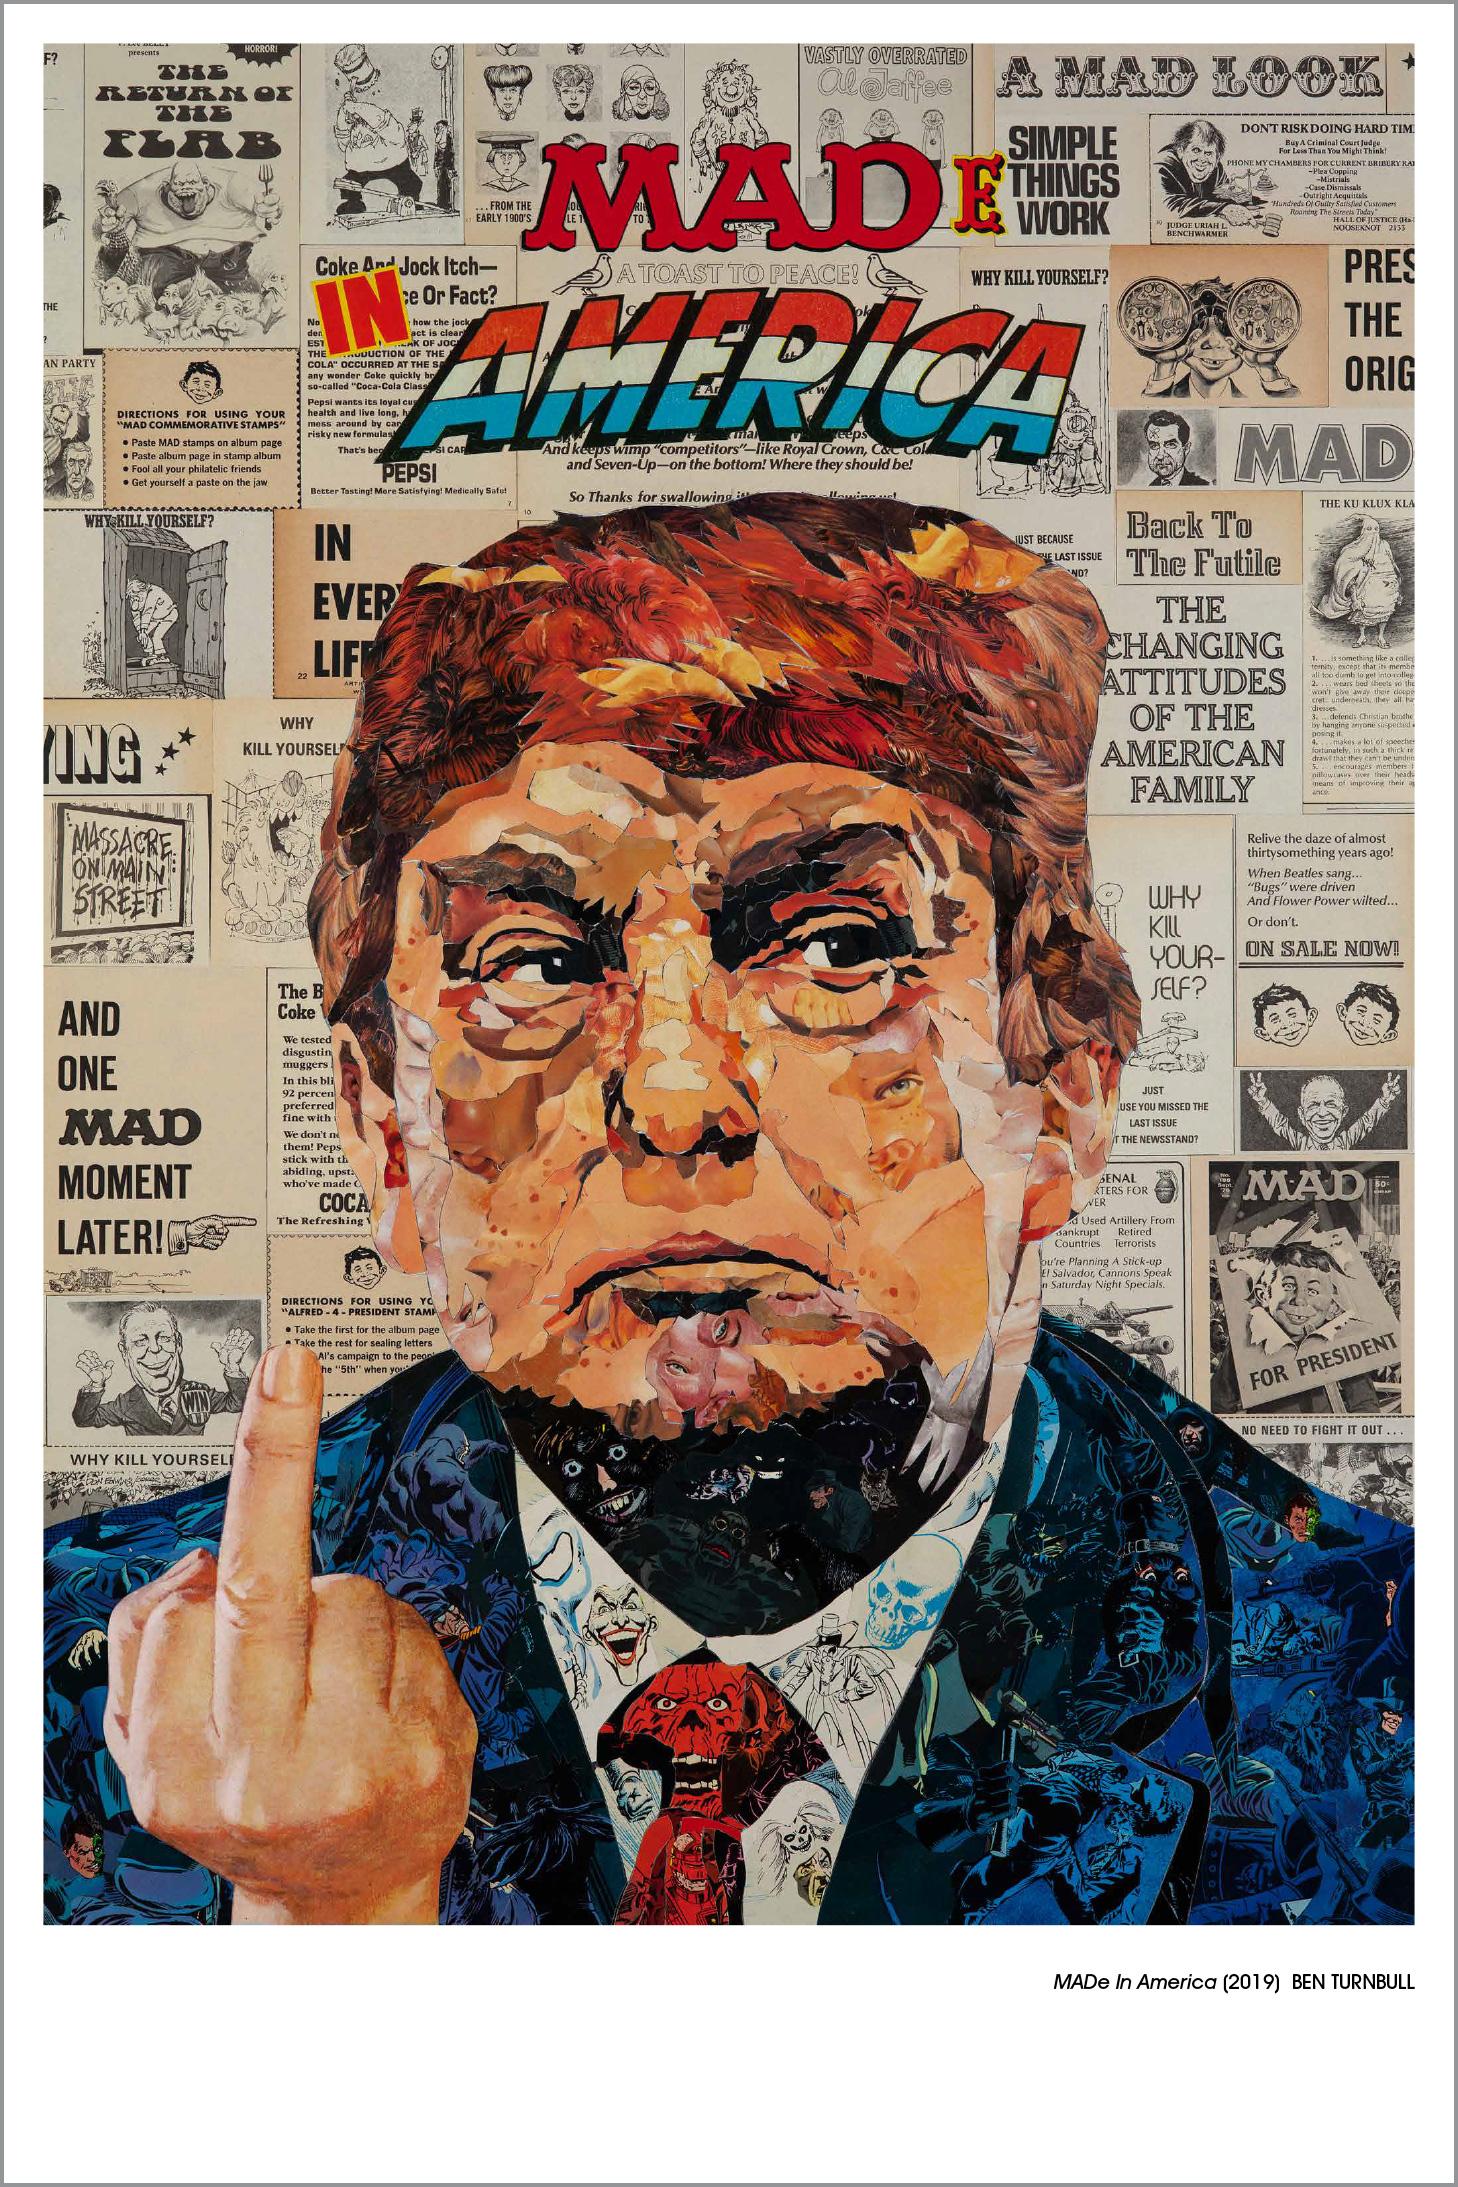 MADe in America (2019) Ben Turnbull